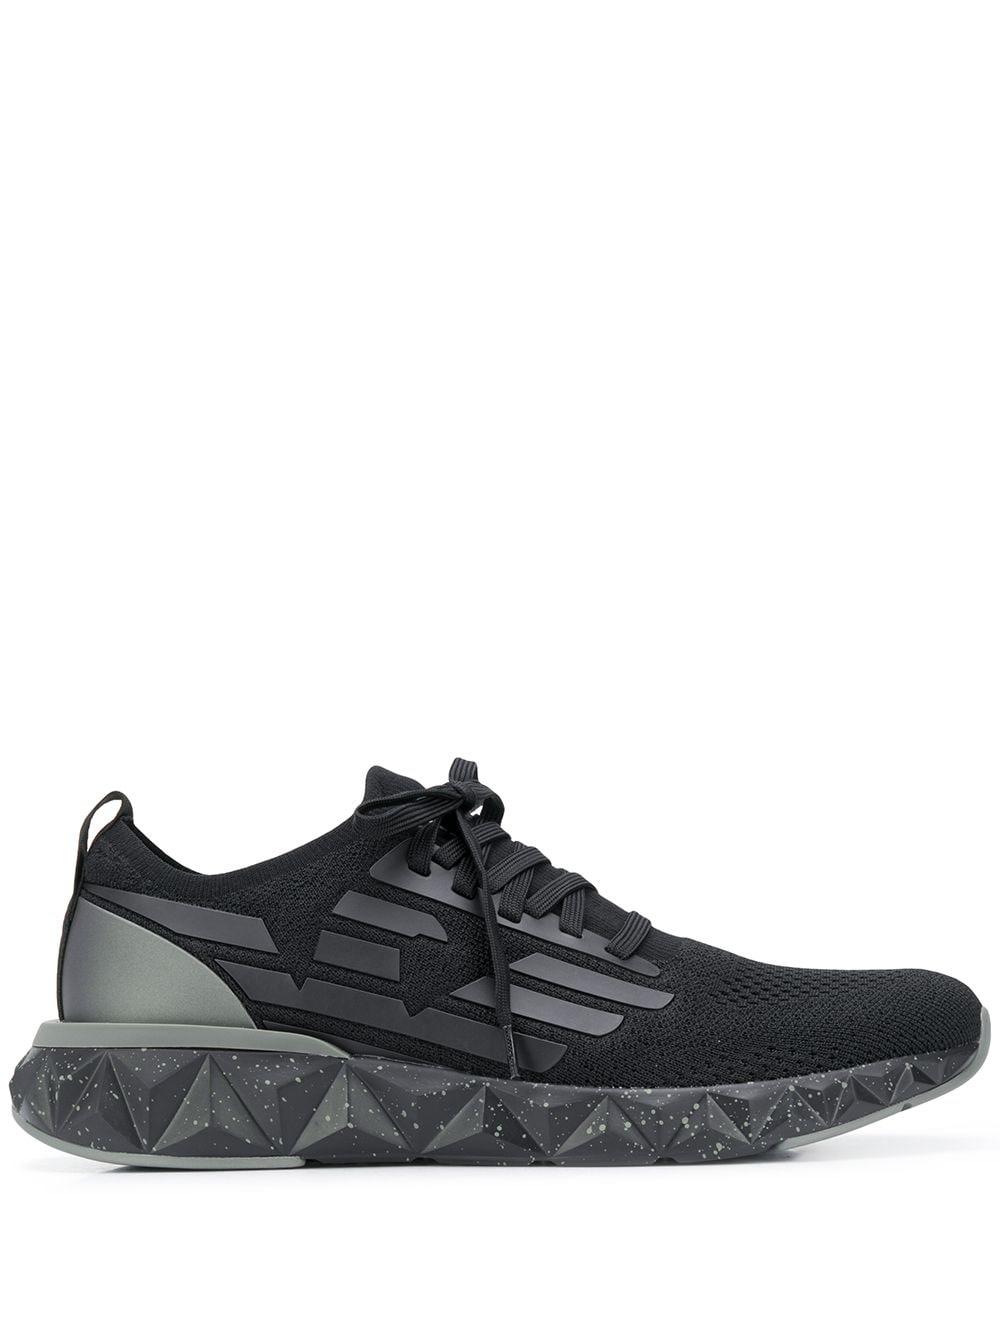 Ultimate 2.0 Sneakers